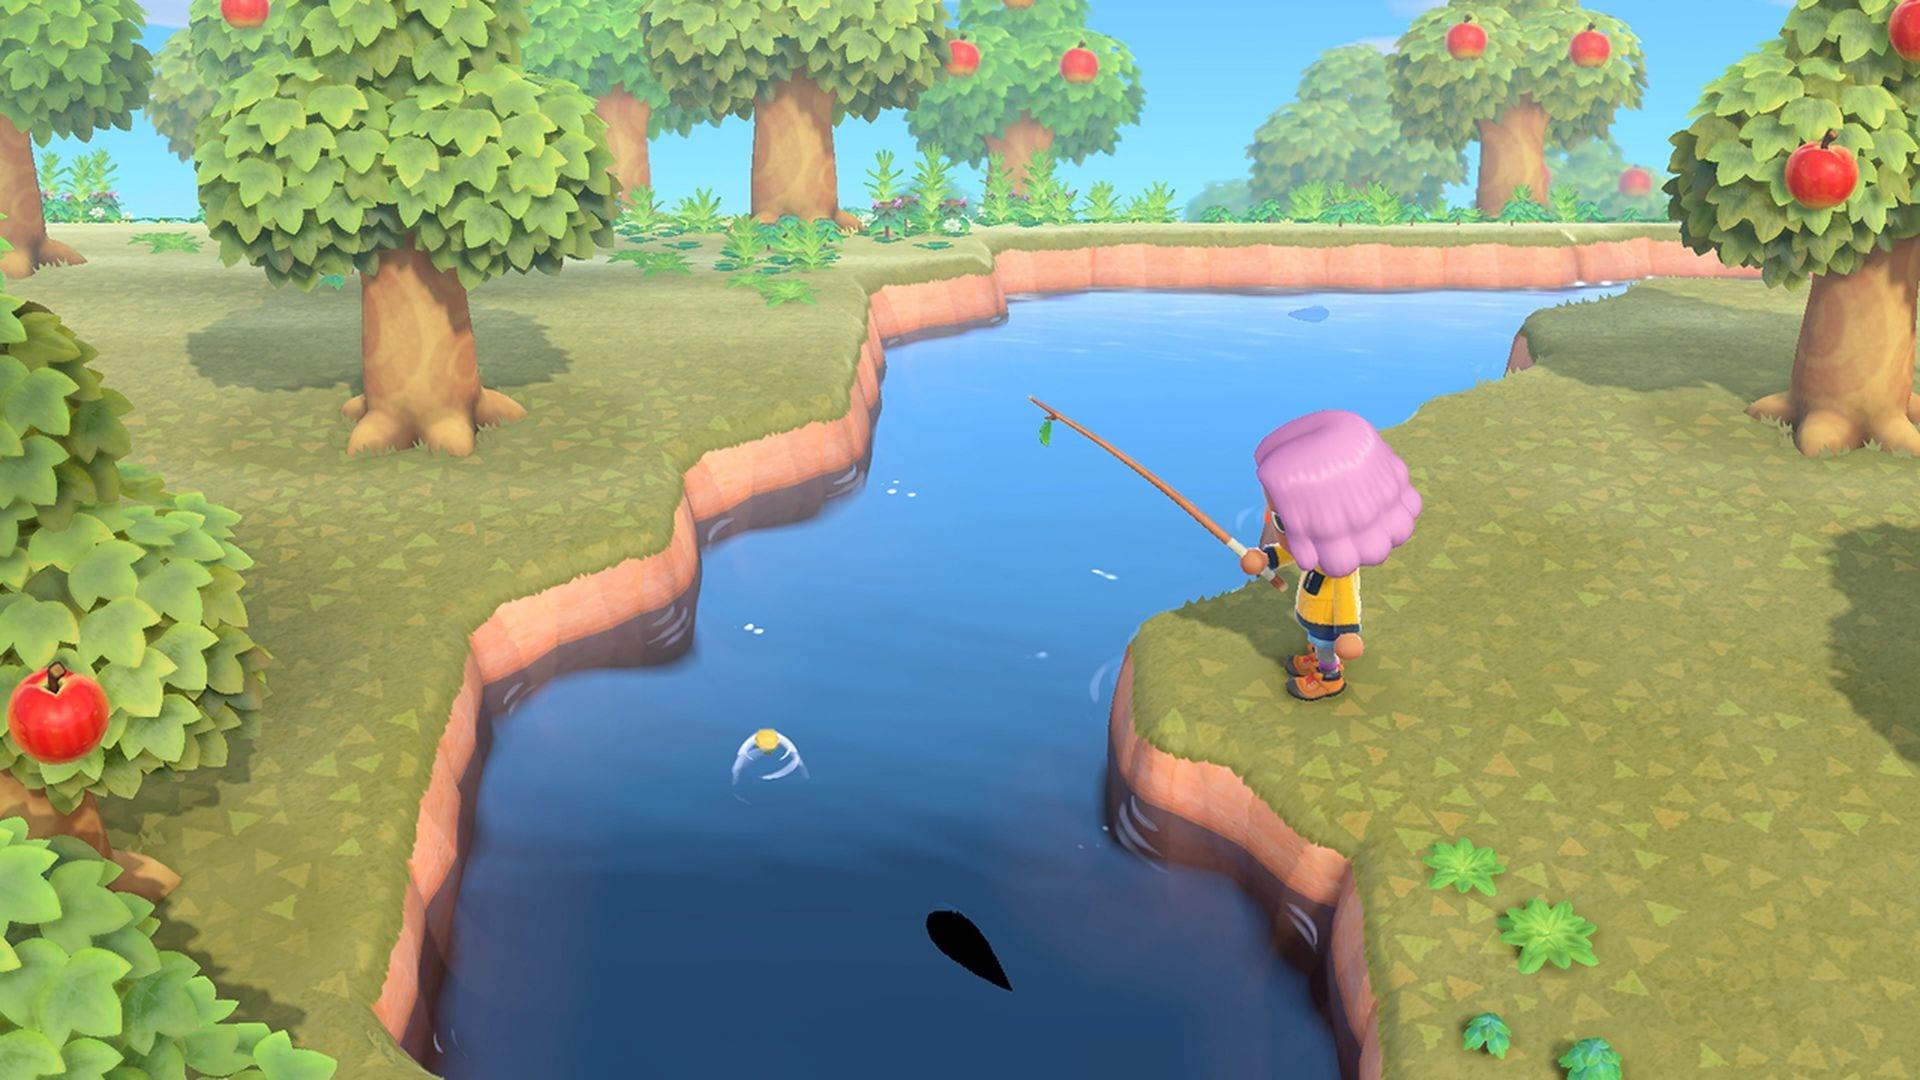 animal crossing new horizons, fishing pole, fishing rod, fishing, new horizons, animal crossing